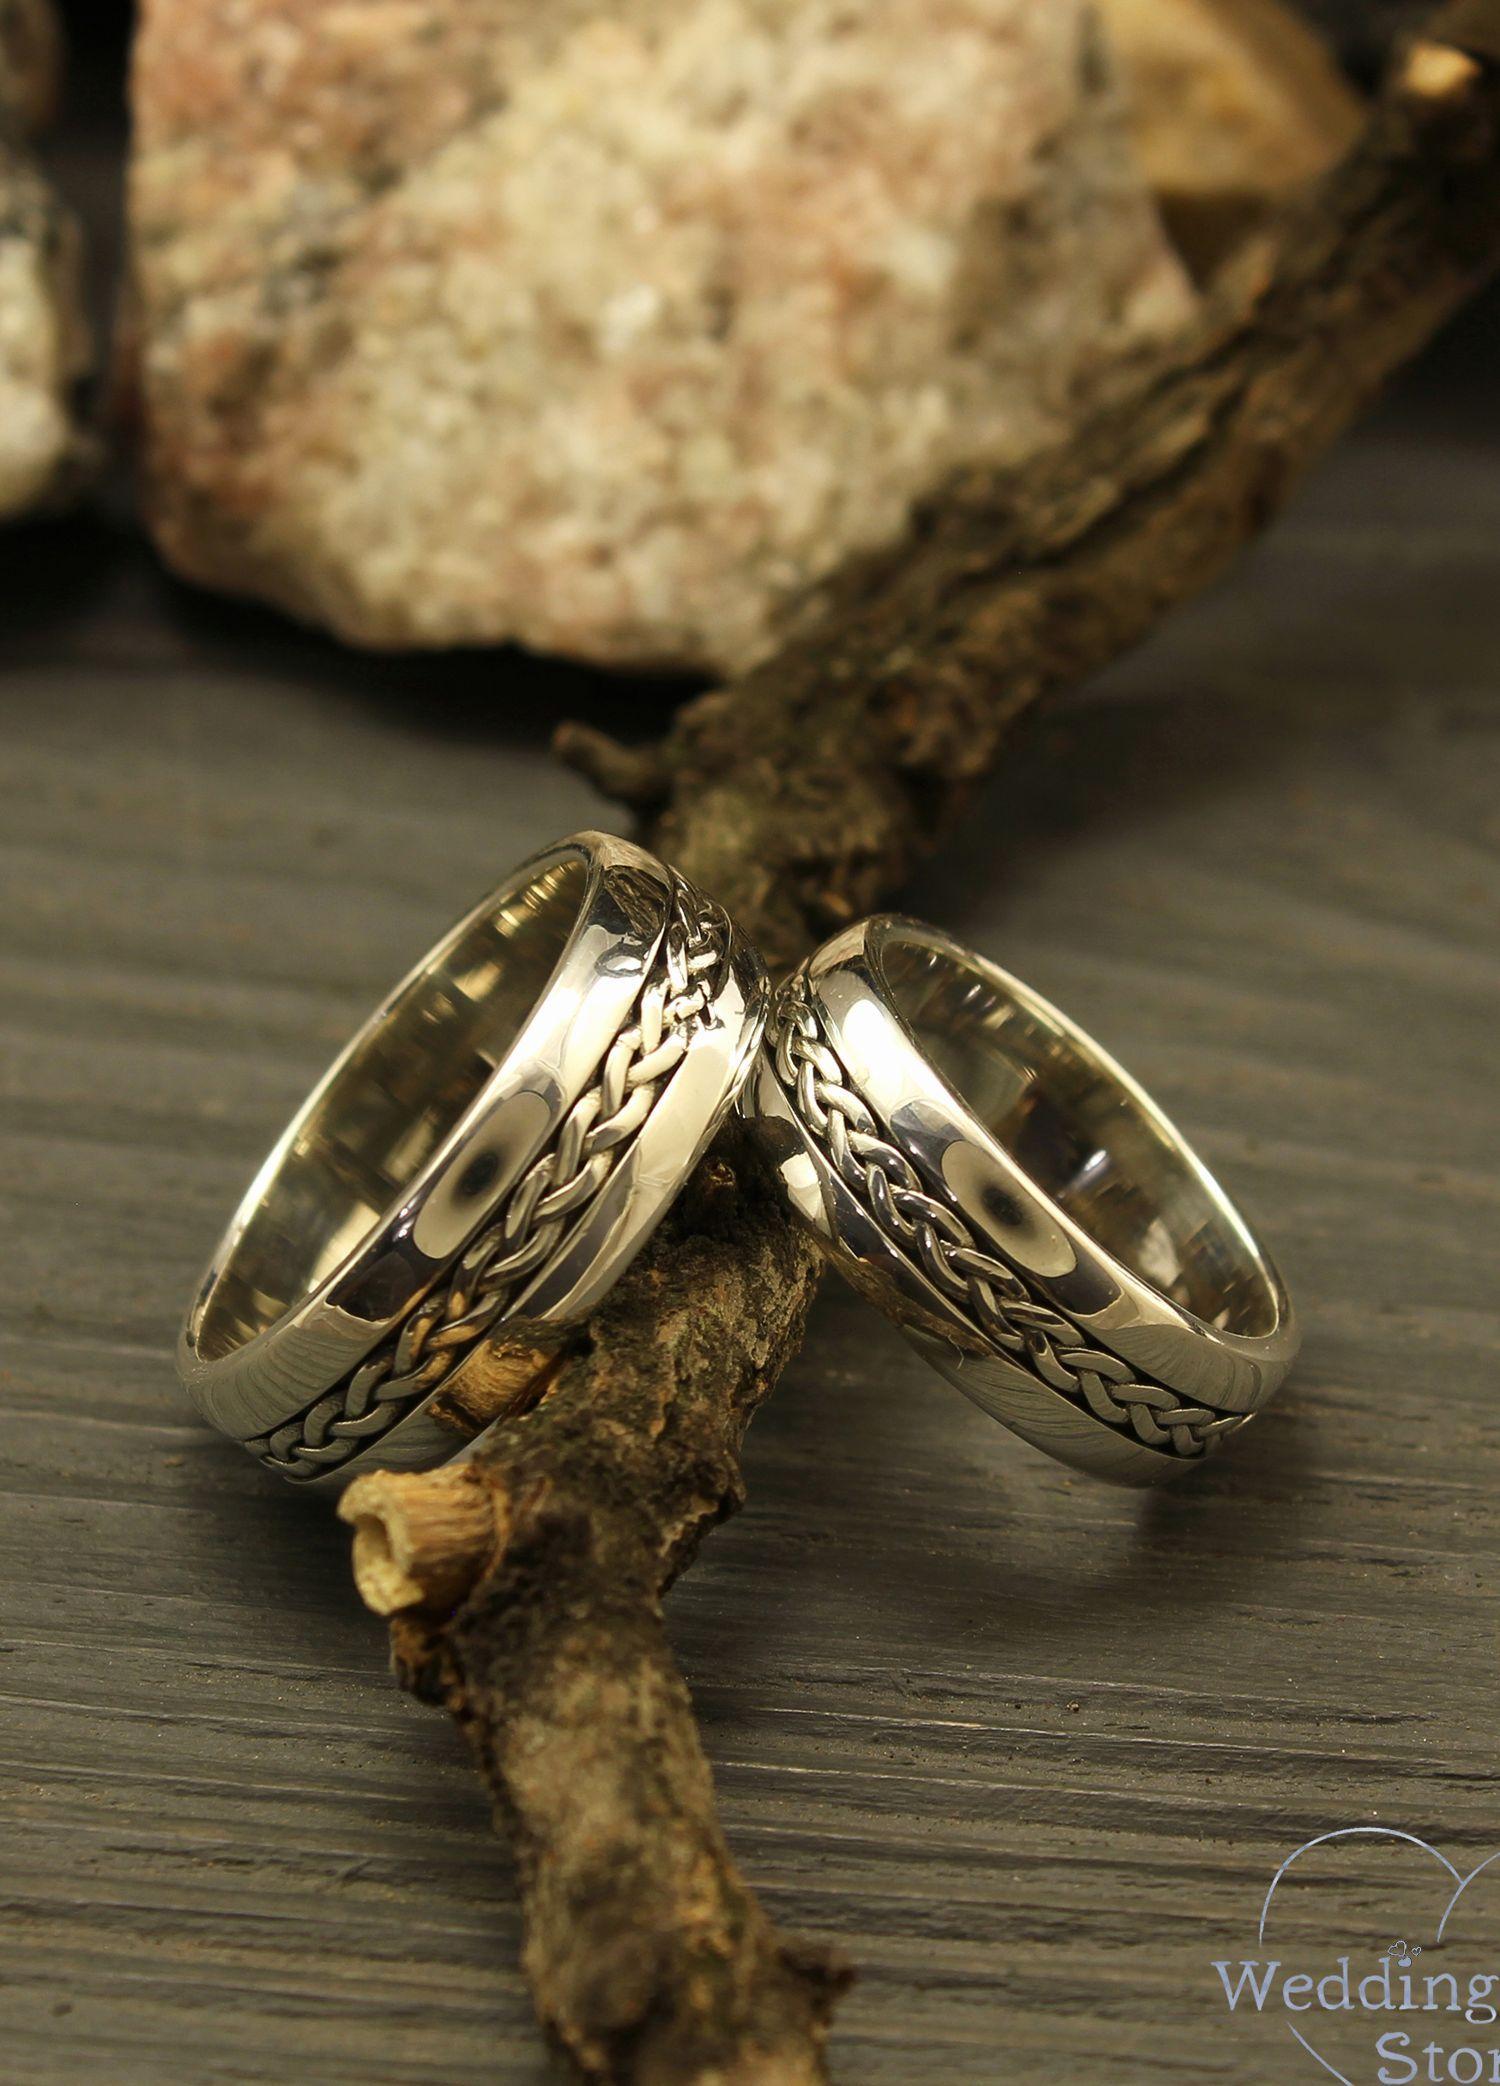 Braided wedding bands, Sterling silver wedding rings